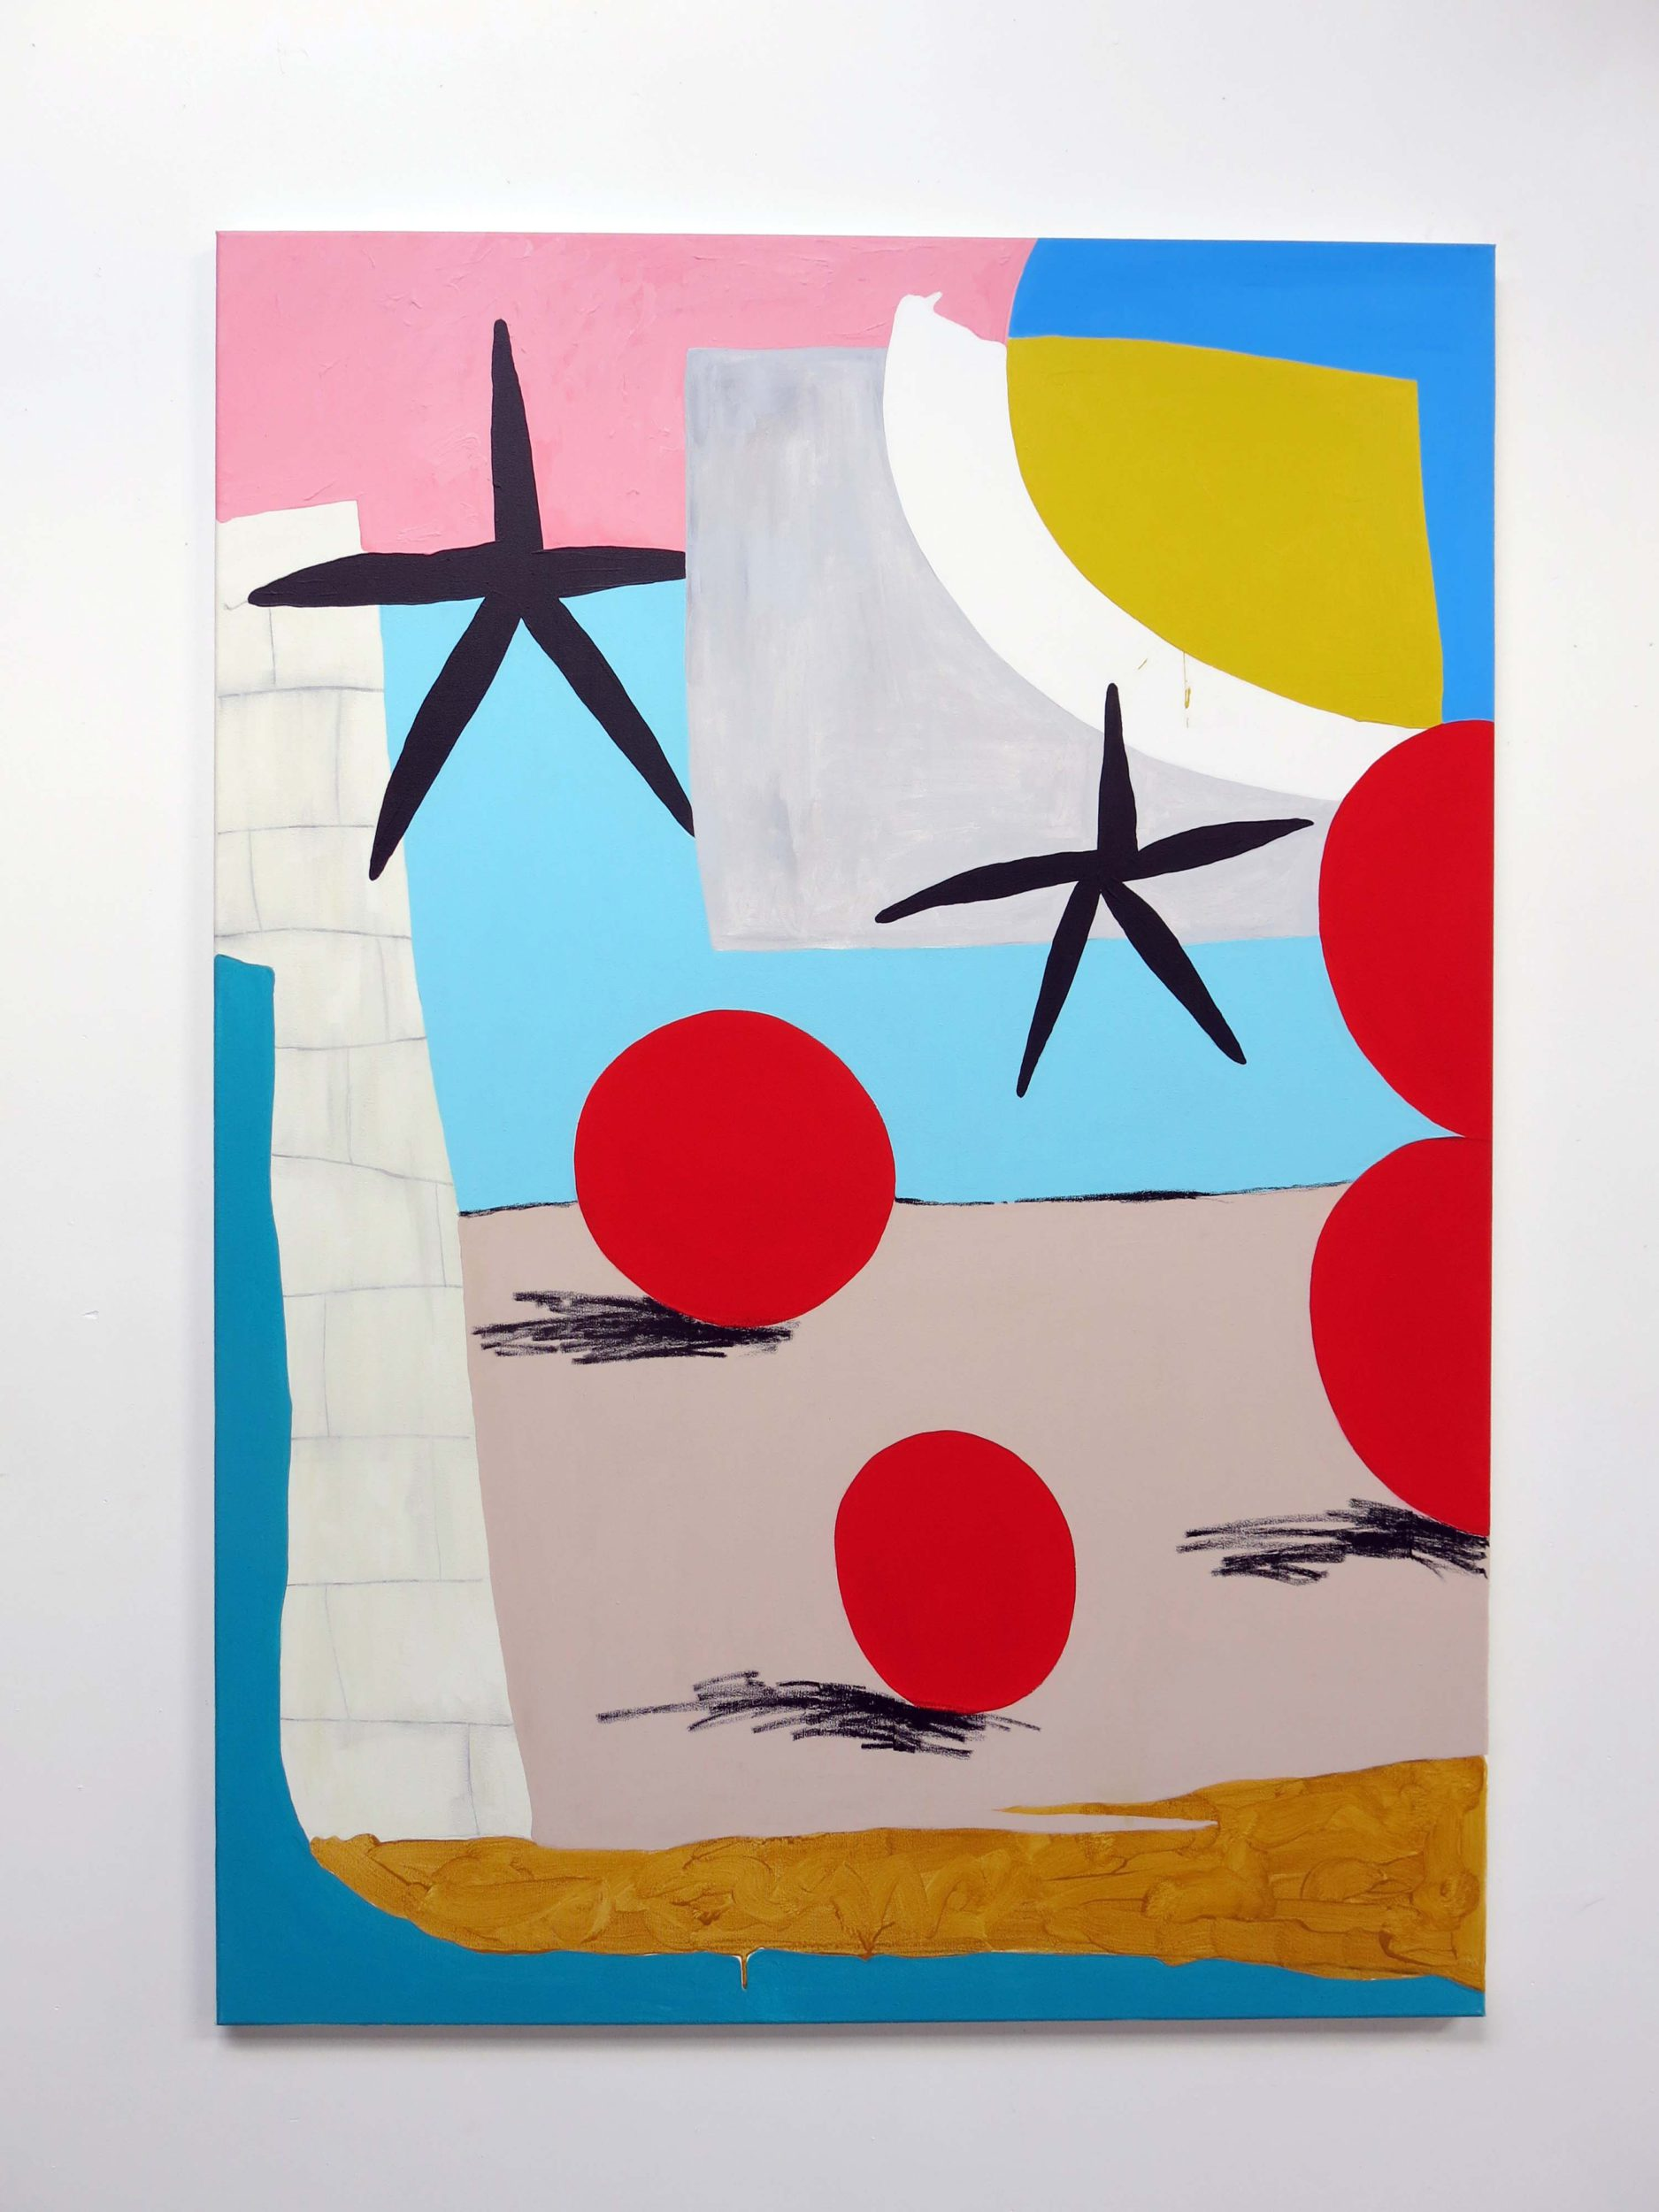 Bruce, Untitled 4, 2018, Acrylics and spray paint on canvas, 100 x 140cm